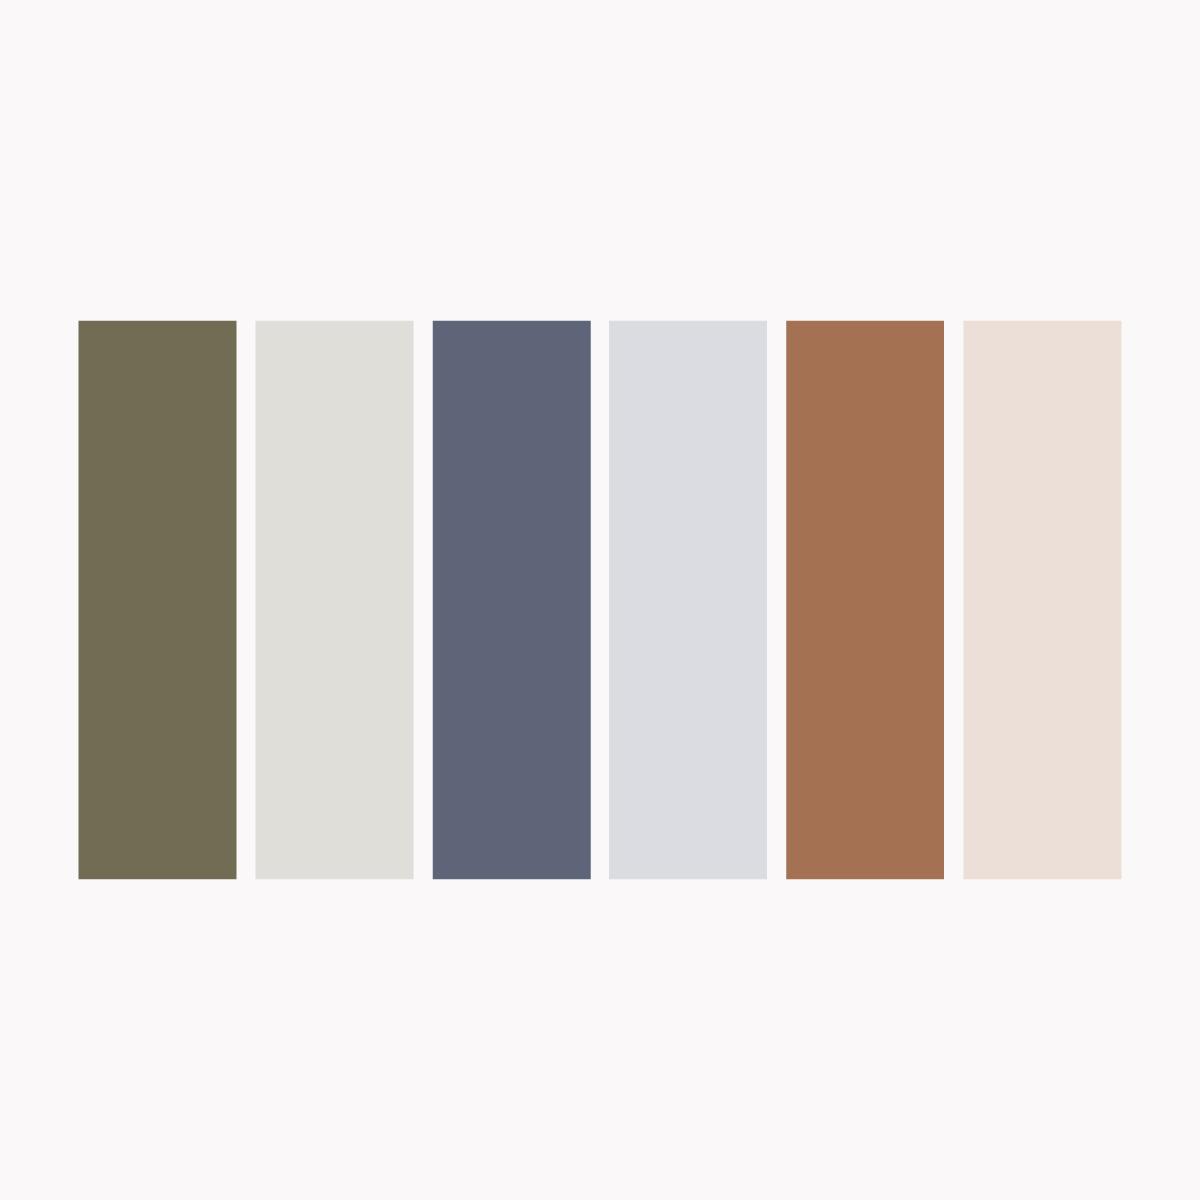 Jacob Due profil farver